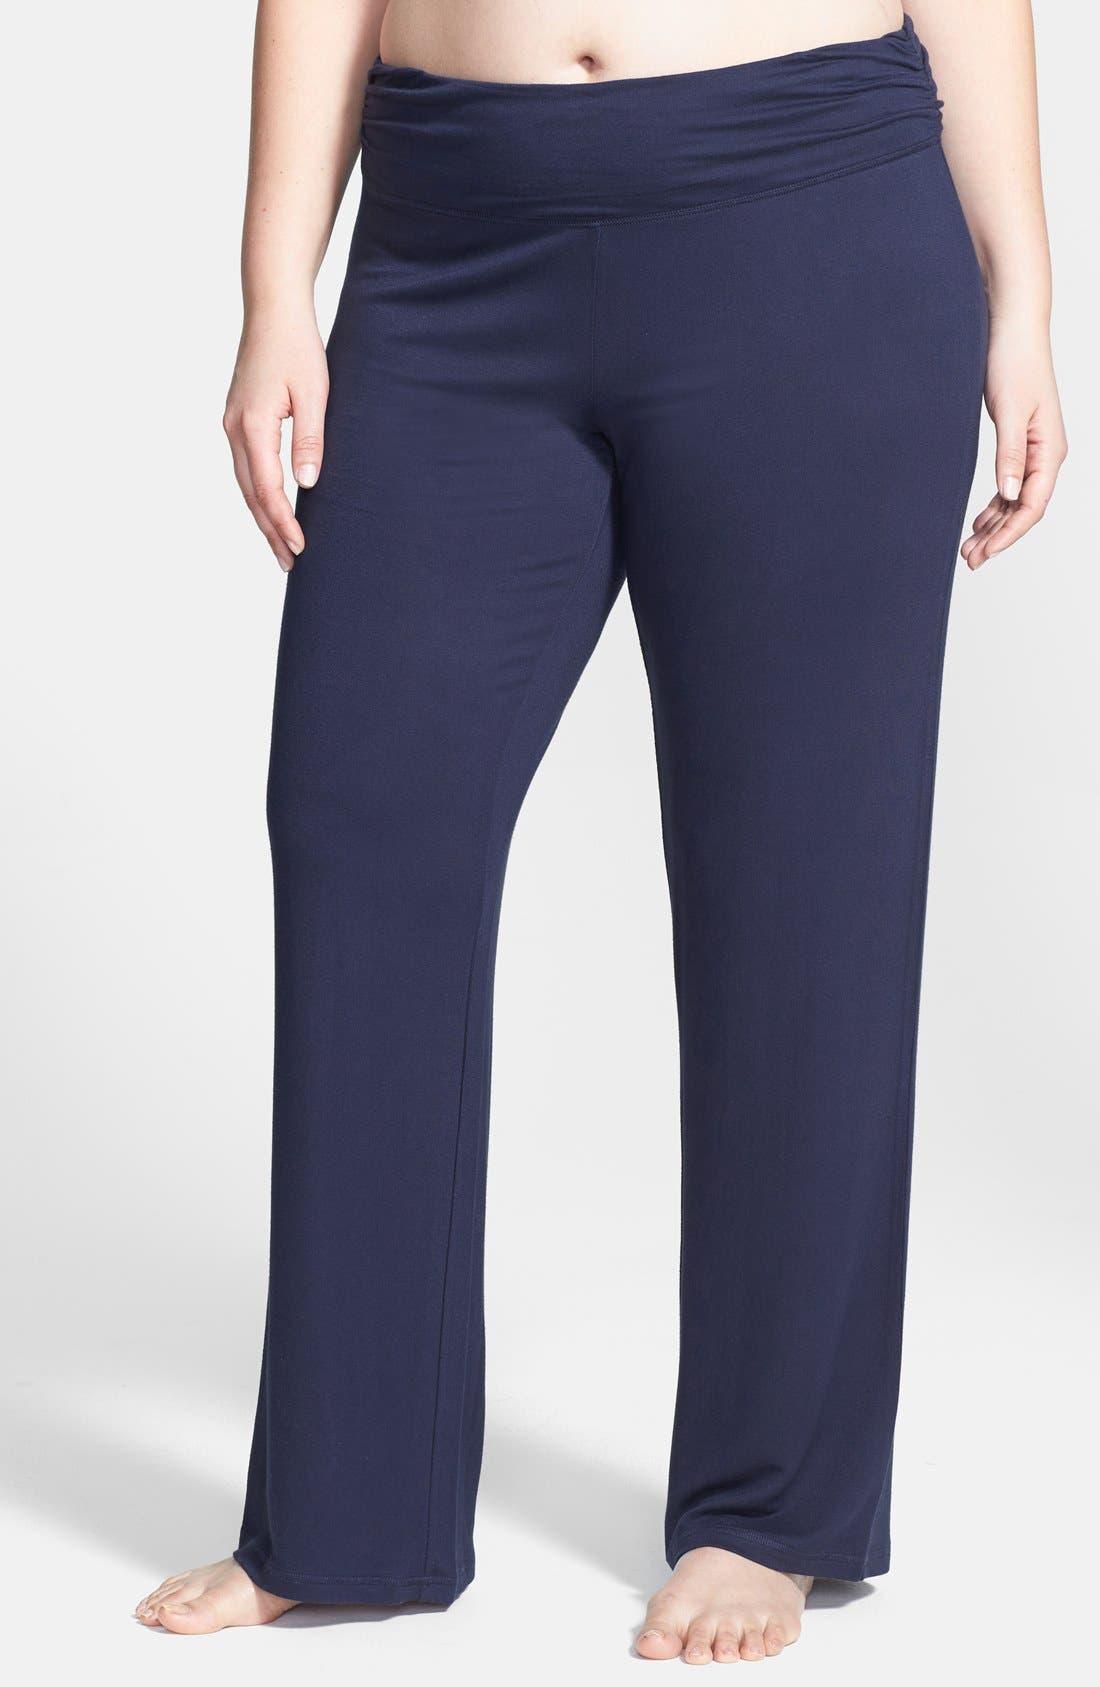 Alternate Image 1 Selected - Shimera Ruched Waist Lounge Pants (Plus Size)